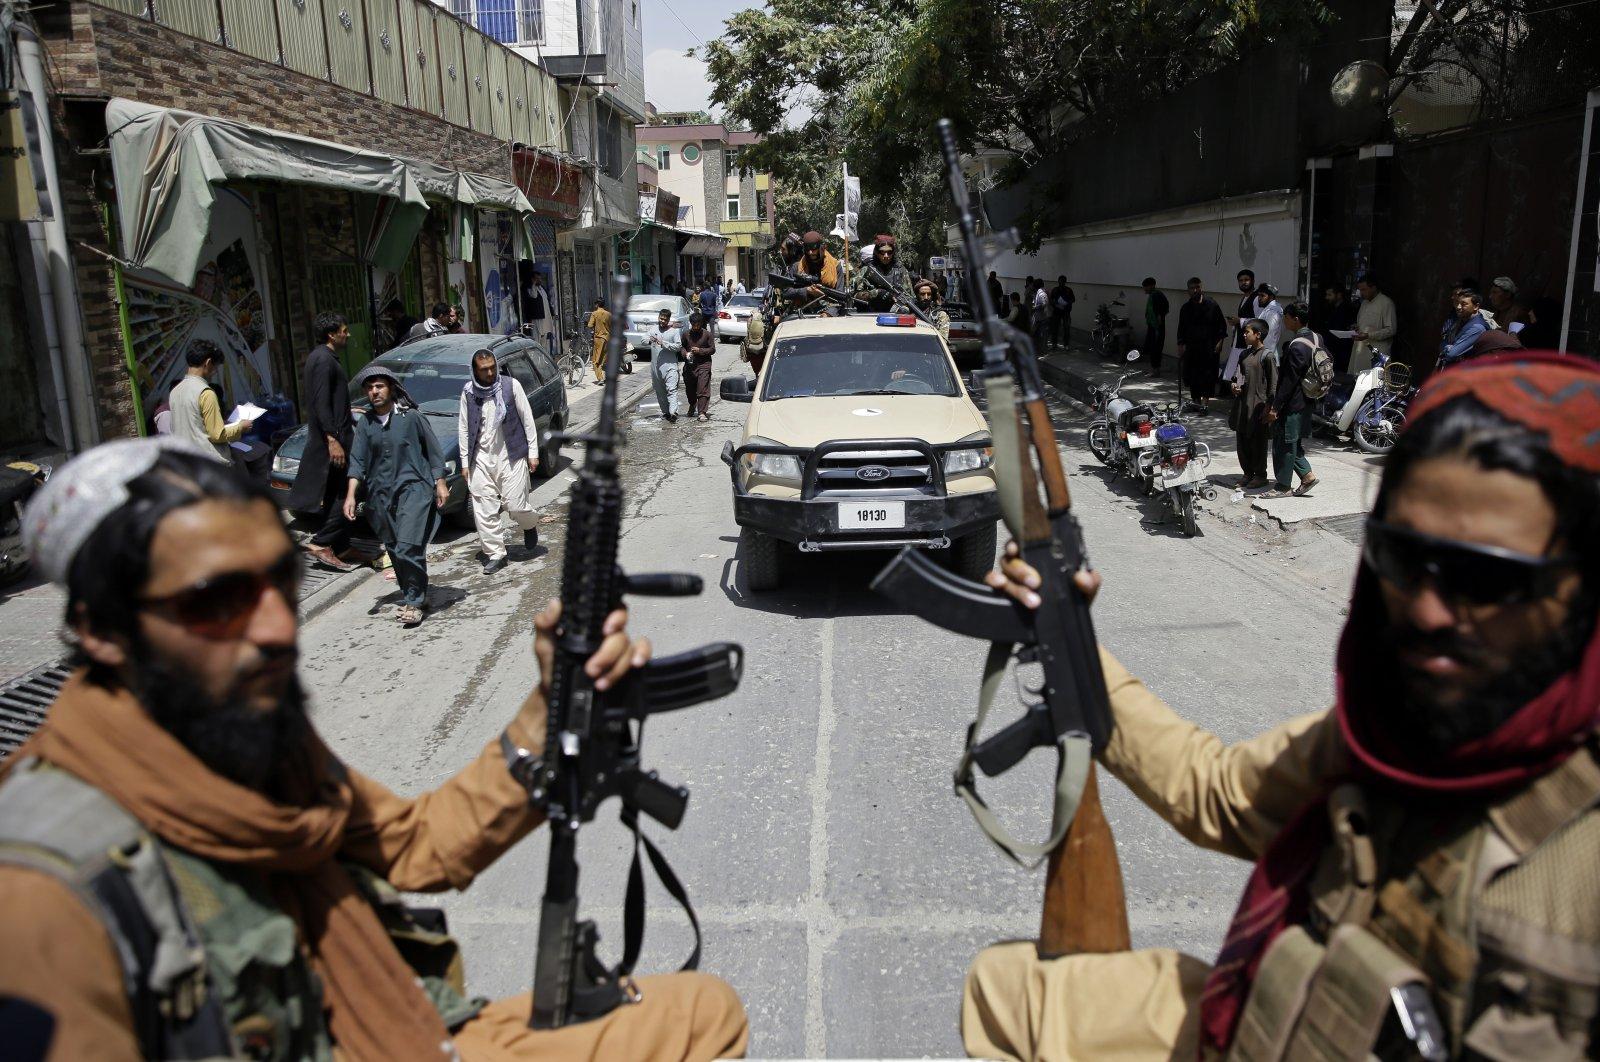 Taliban fighters patrol in Kabul, Afghanistan, Aug. 19, 2021. (AP Photo)